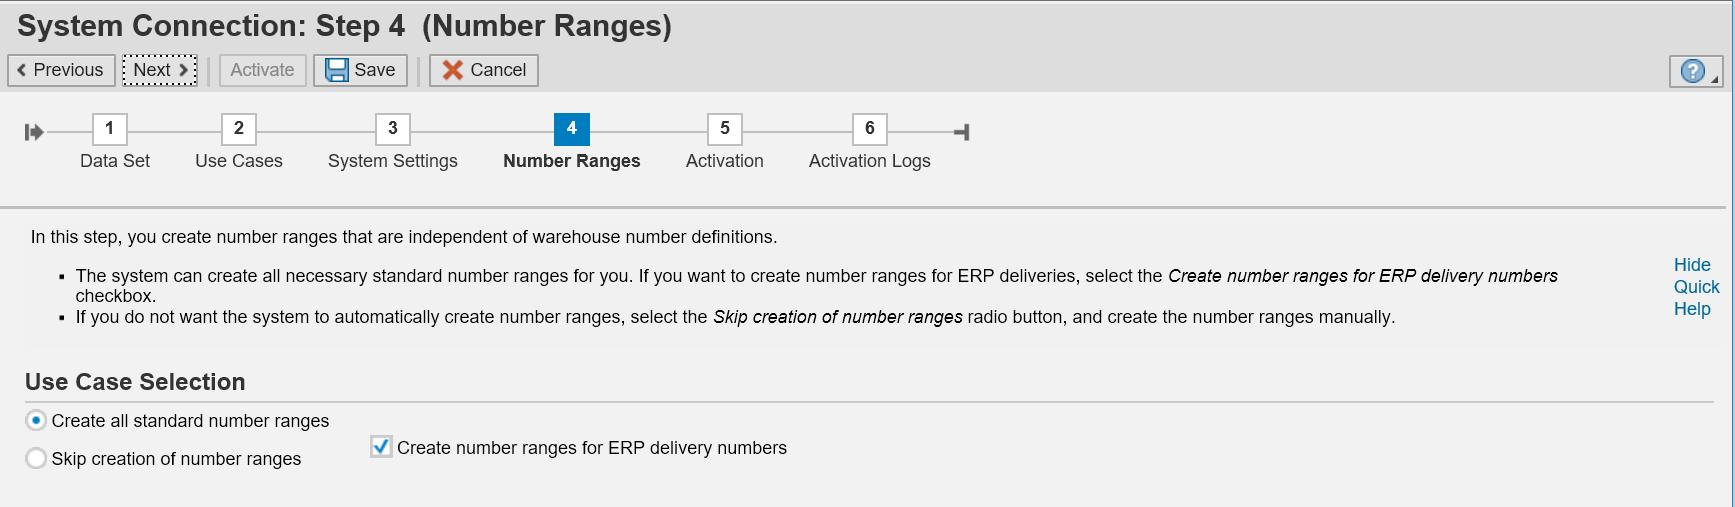 Basic Settings For Sap Ewm In Sap S 4hana 1709 Sap Blogs